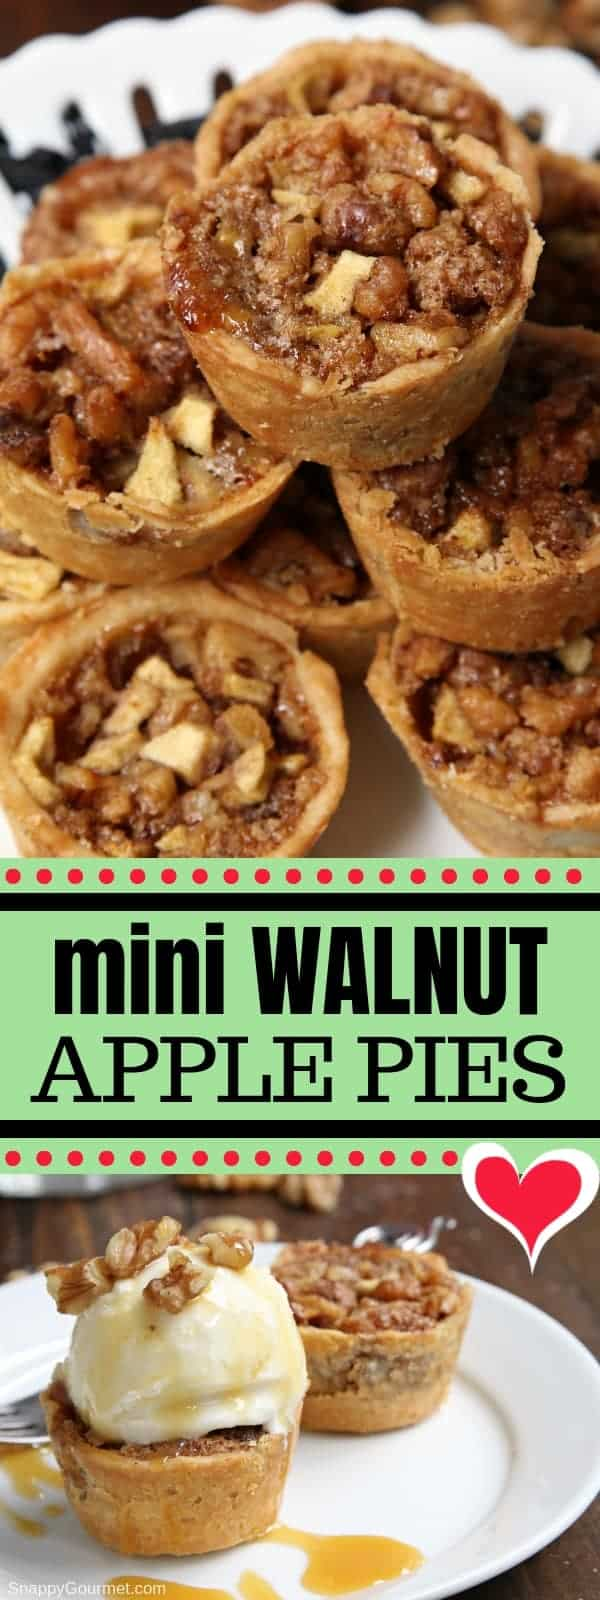 Mini Walnut Apple Pies - easy muffin tin apple pie recipes